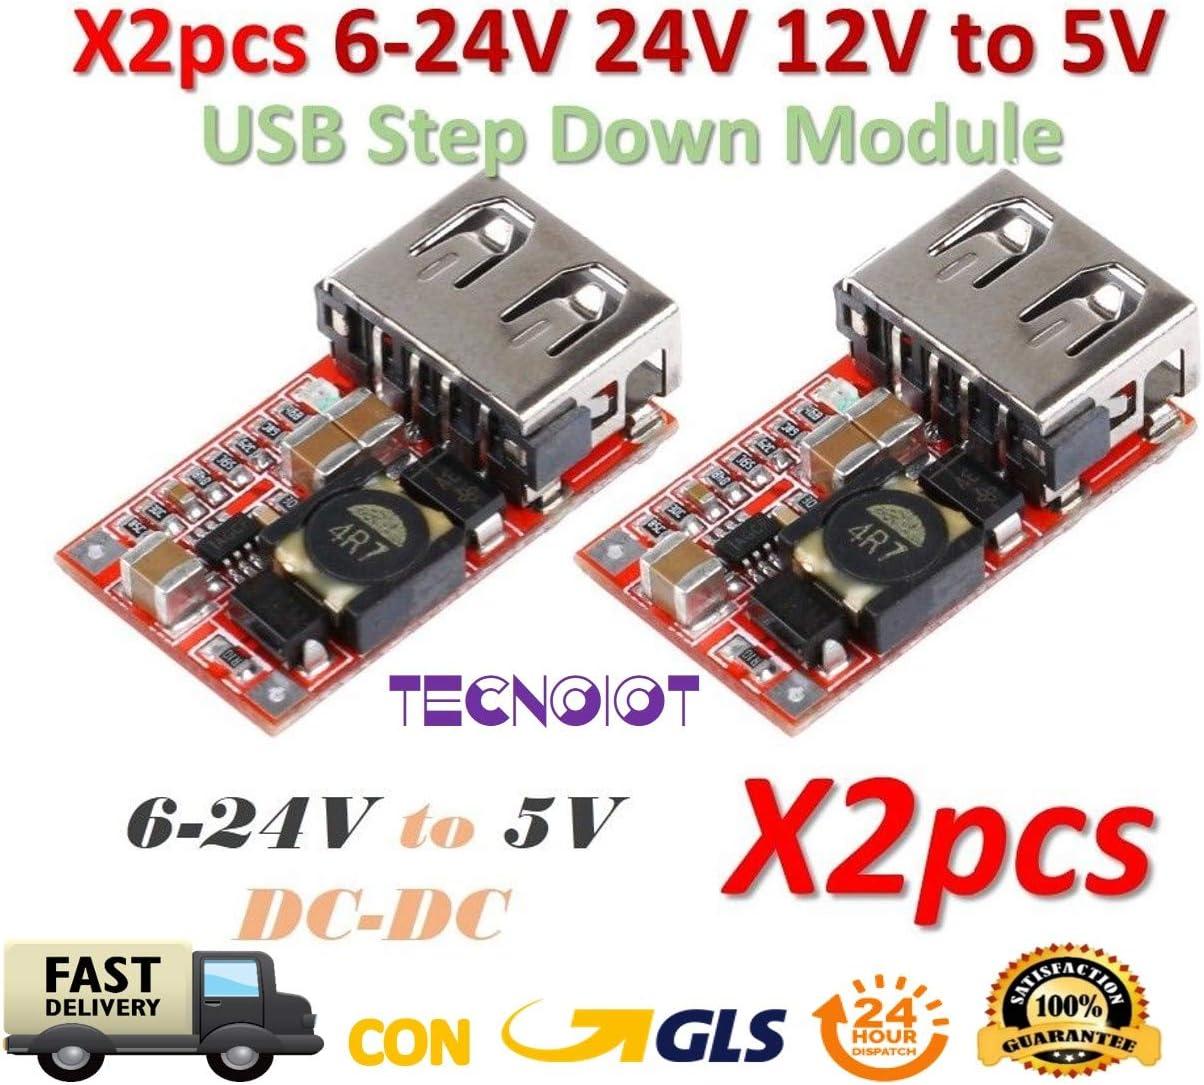 TECNOIOT 2pcs 6-24V 24V 12V to 5V USB Step Down Module DC-DC Converter | 2 Pieces DC-DC Buck Module 6-24V 12V/24V to 5V 3A USB Step Down Power Supply Charger Efficiency 97.5%